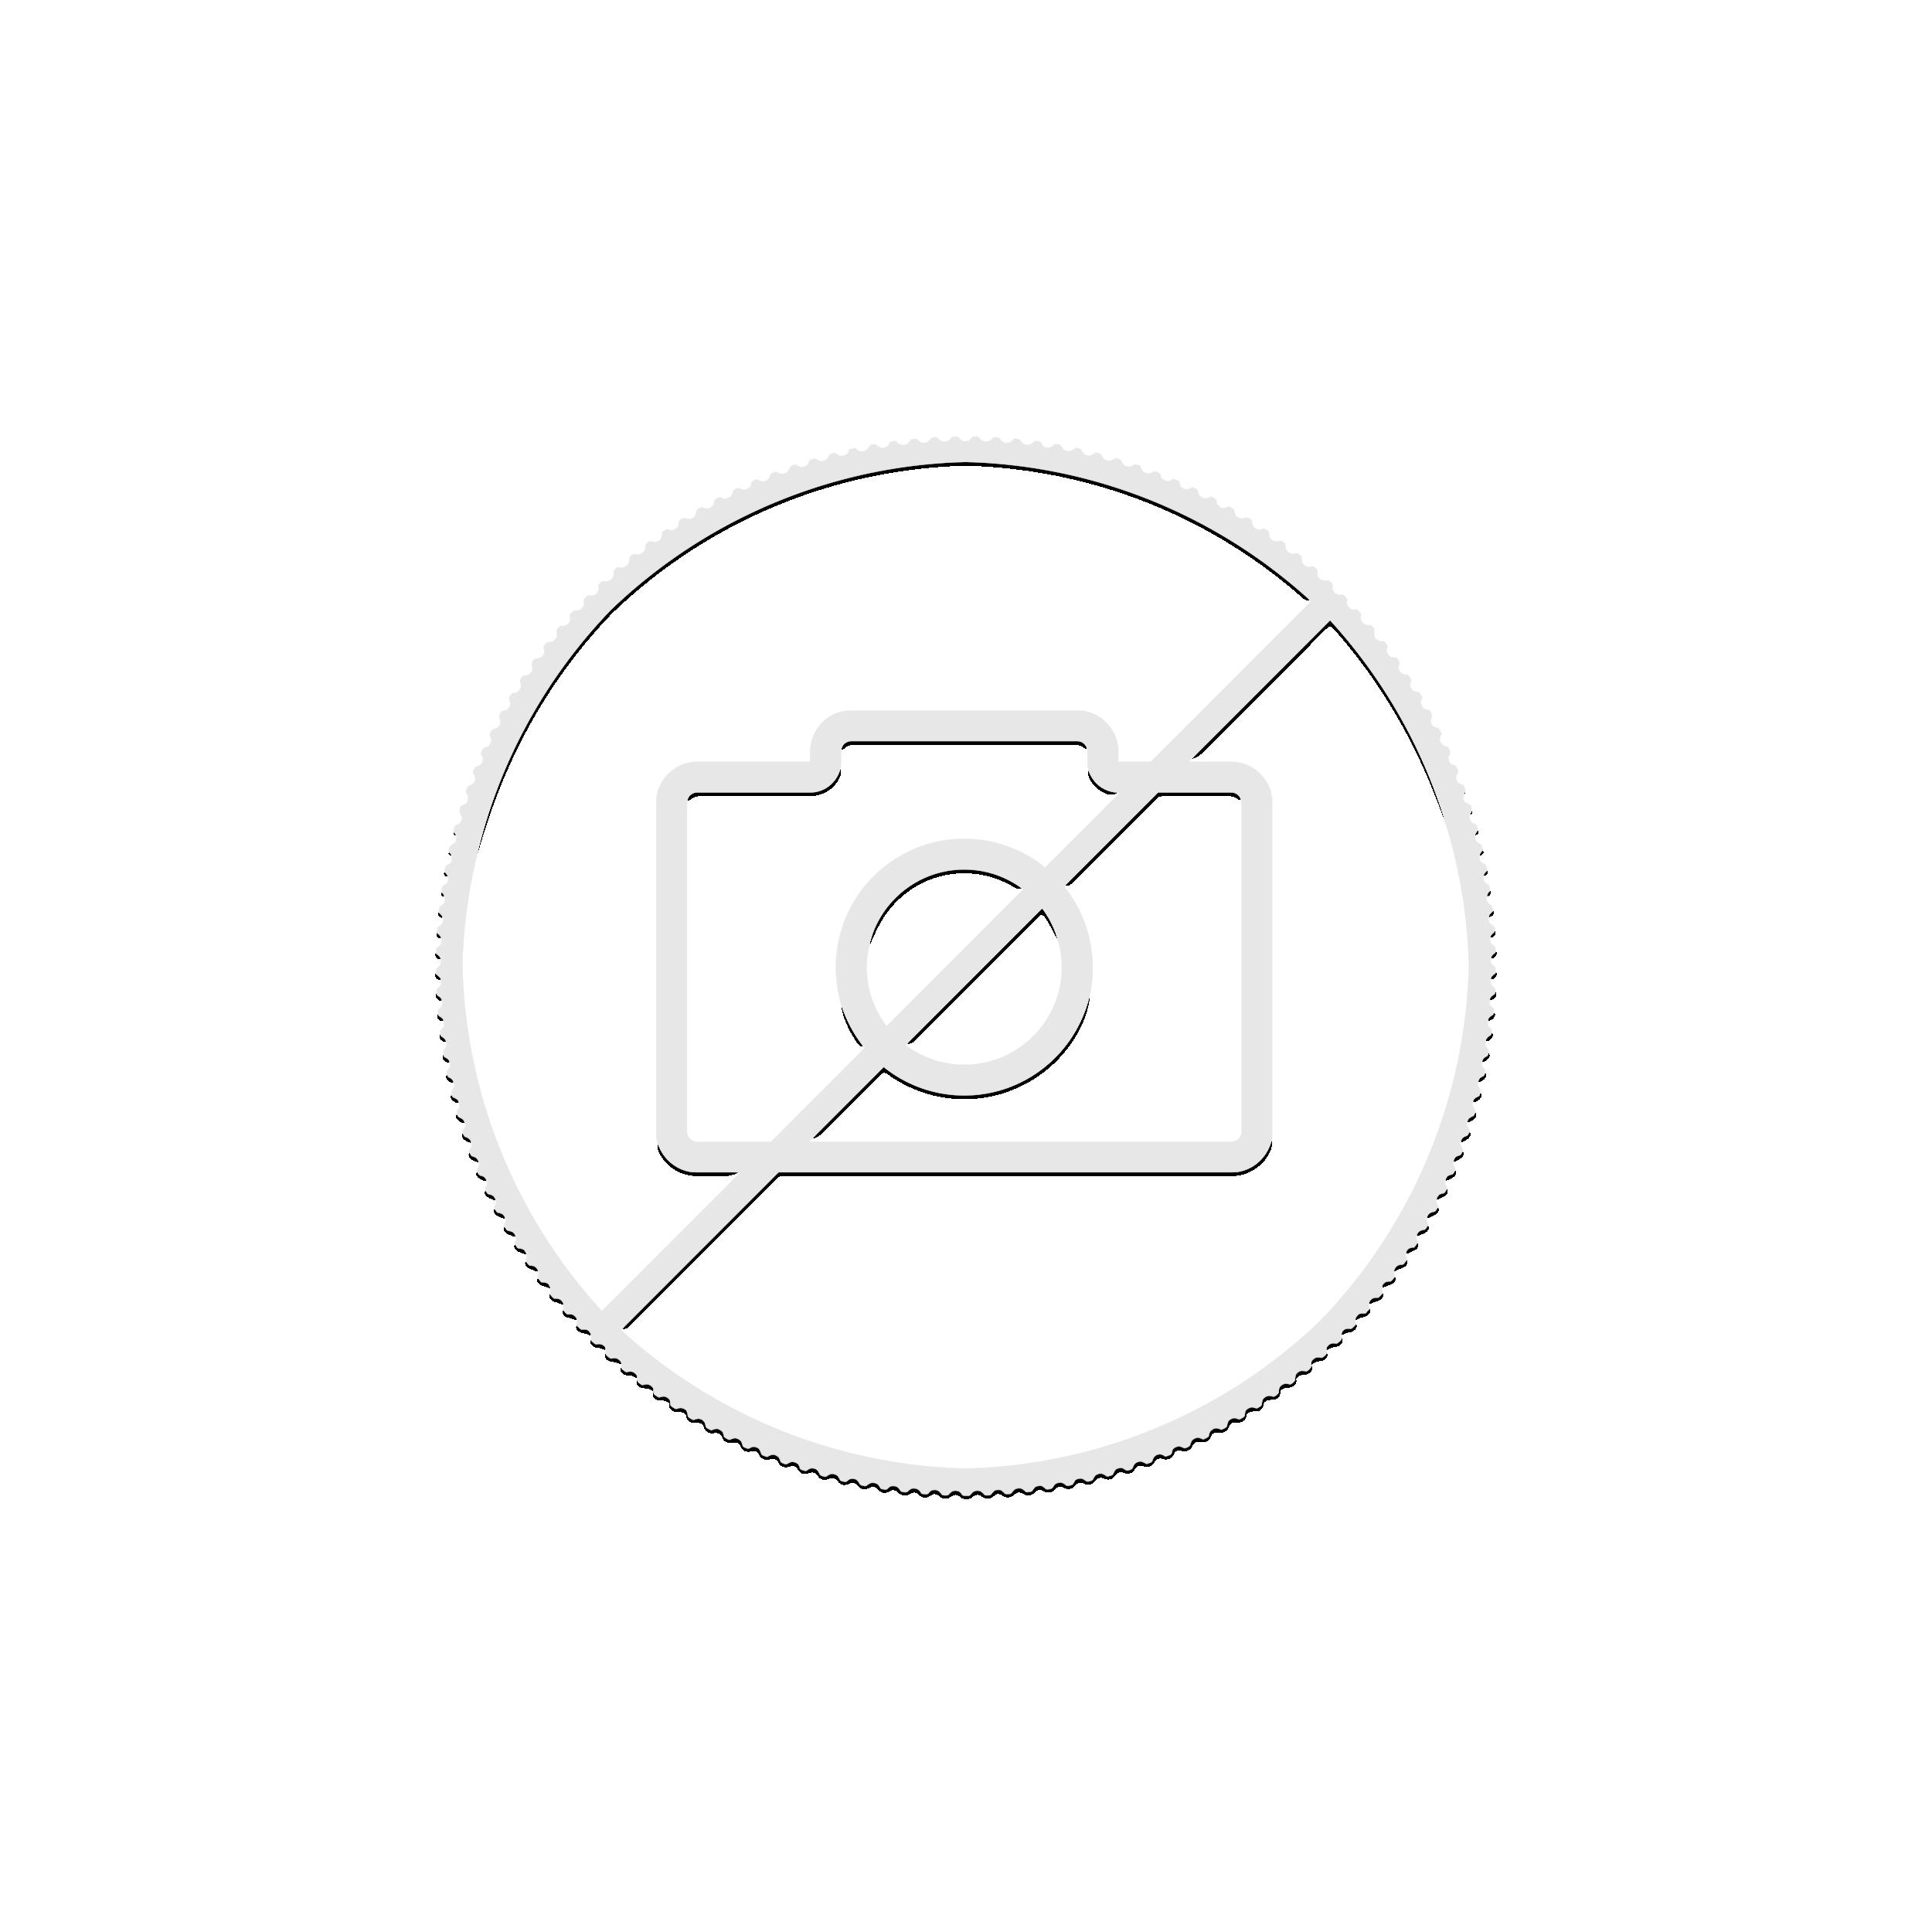 1 troy ounce zilveren munt dragon 2021 - achterkant